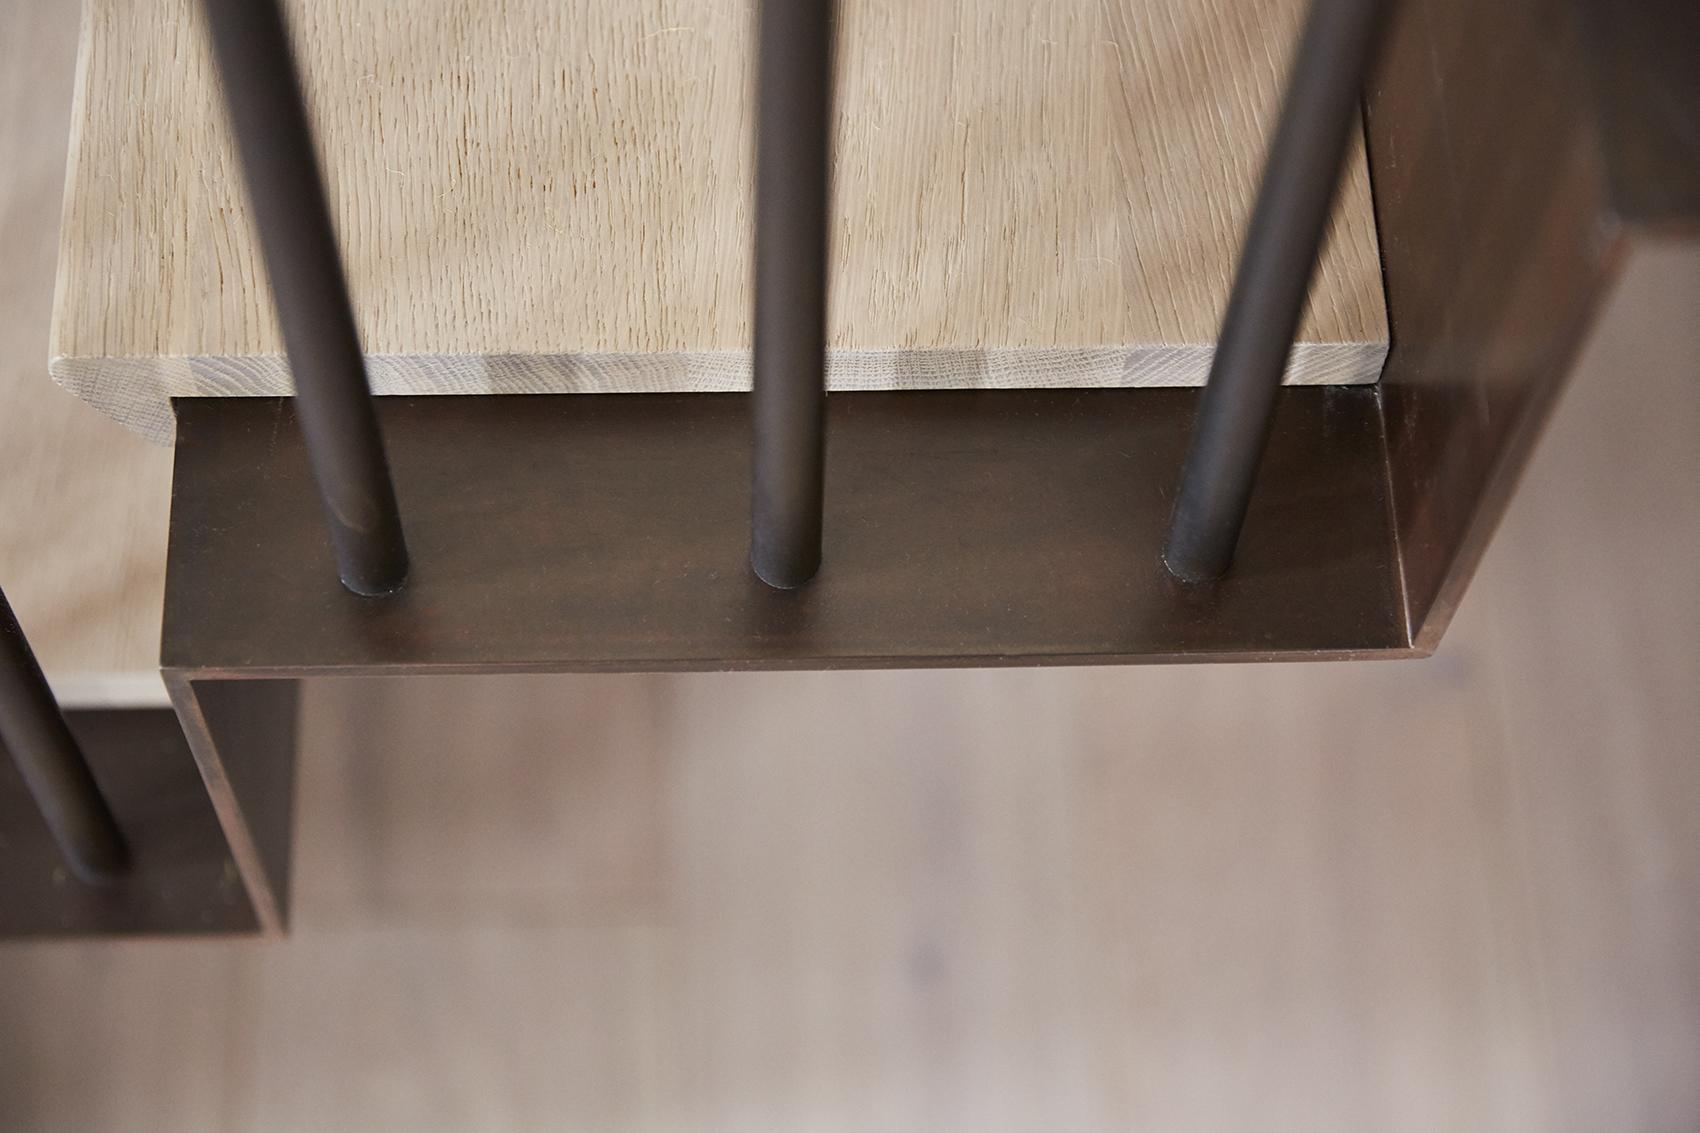 bauer metal fabrication architectural metalwork minnesota mn34.jpg